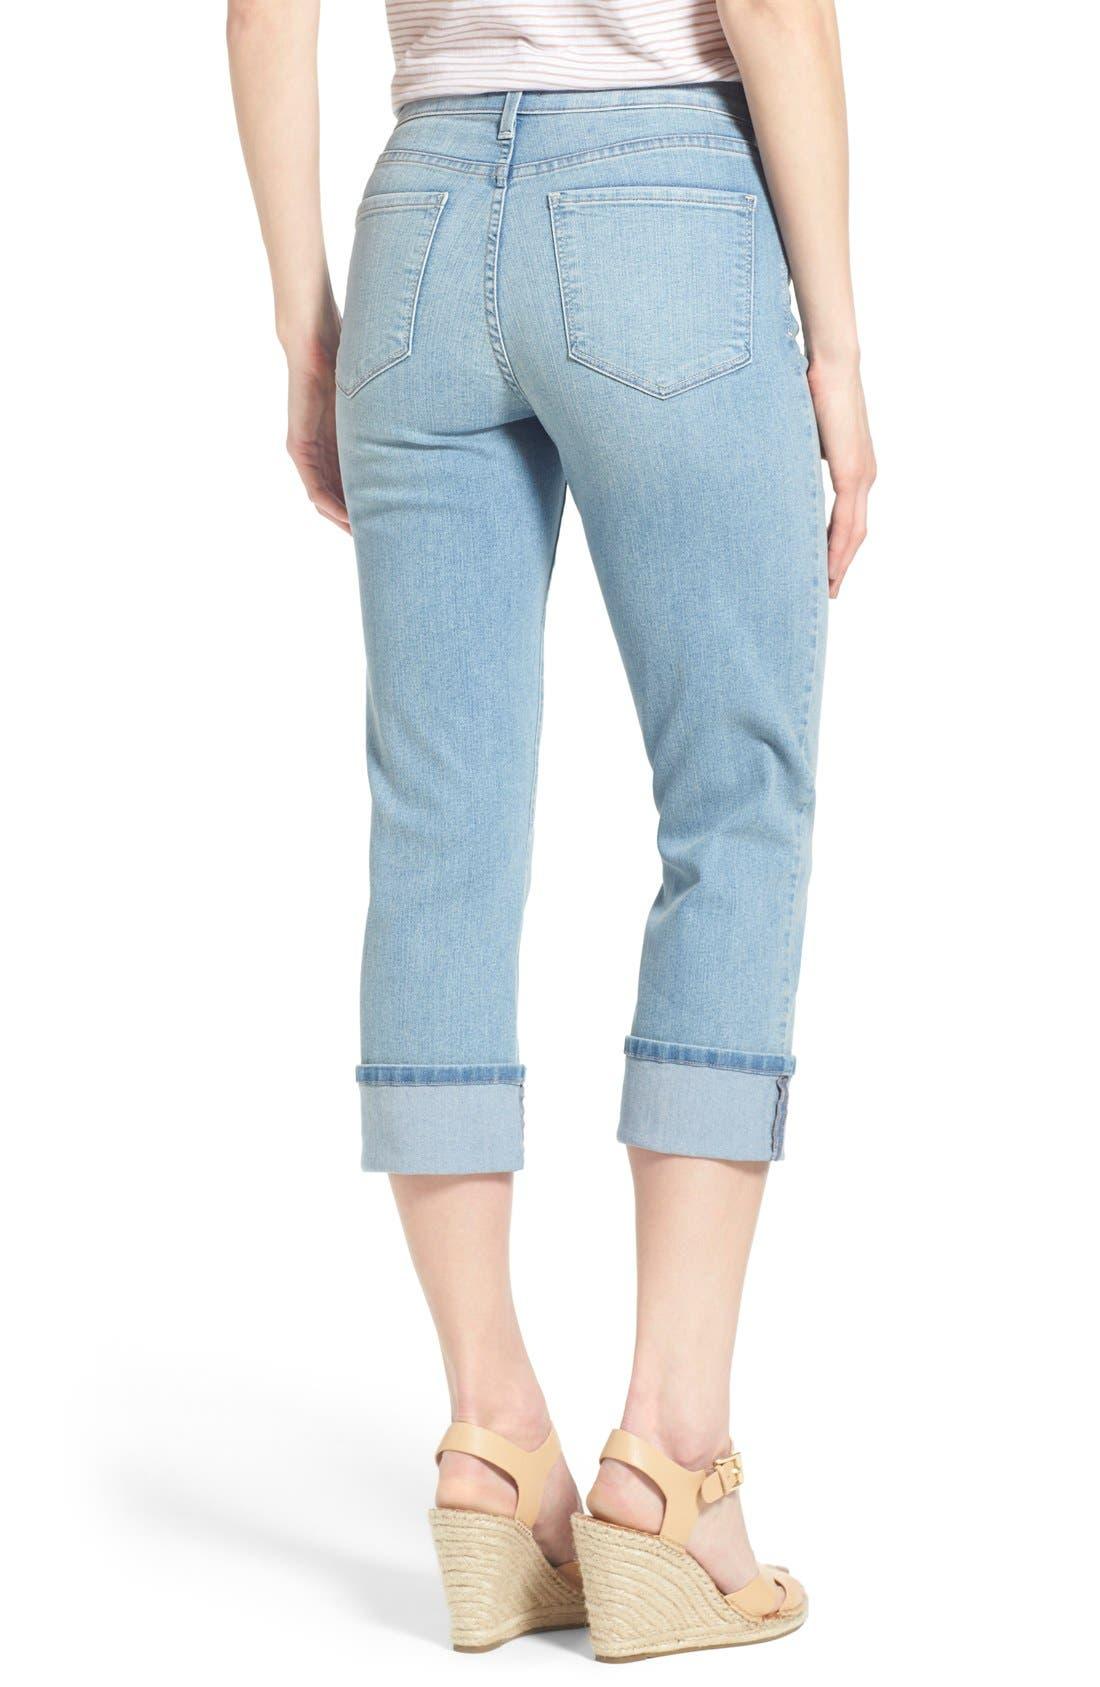 'Dayla' Colored Wide Cuff Capri Jeans,                             Alternate thumbnail 40, color,